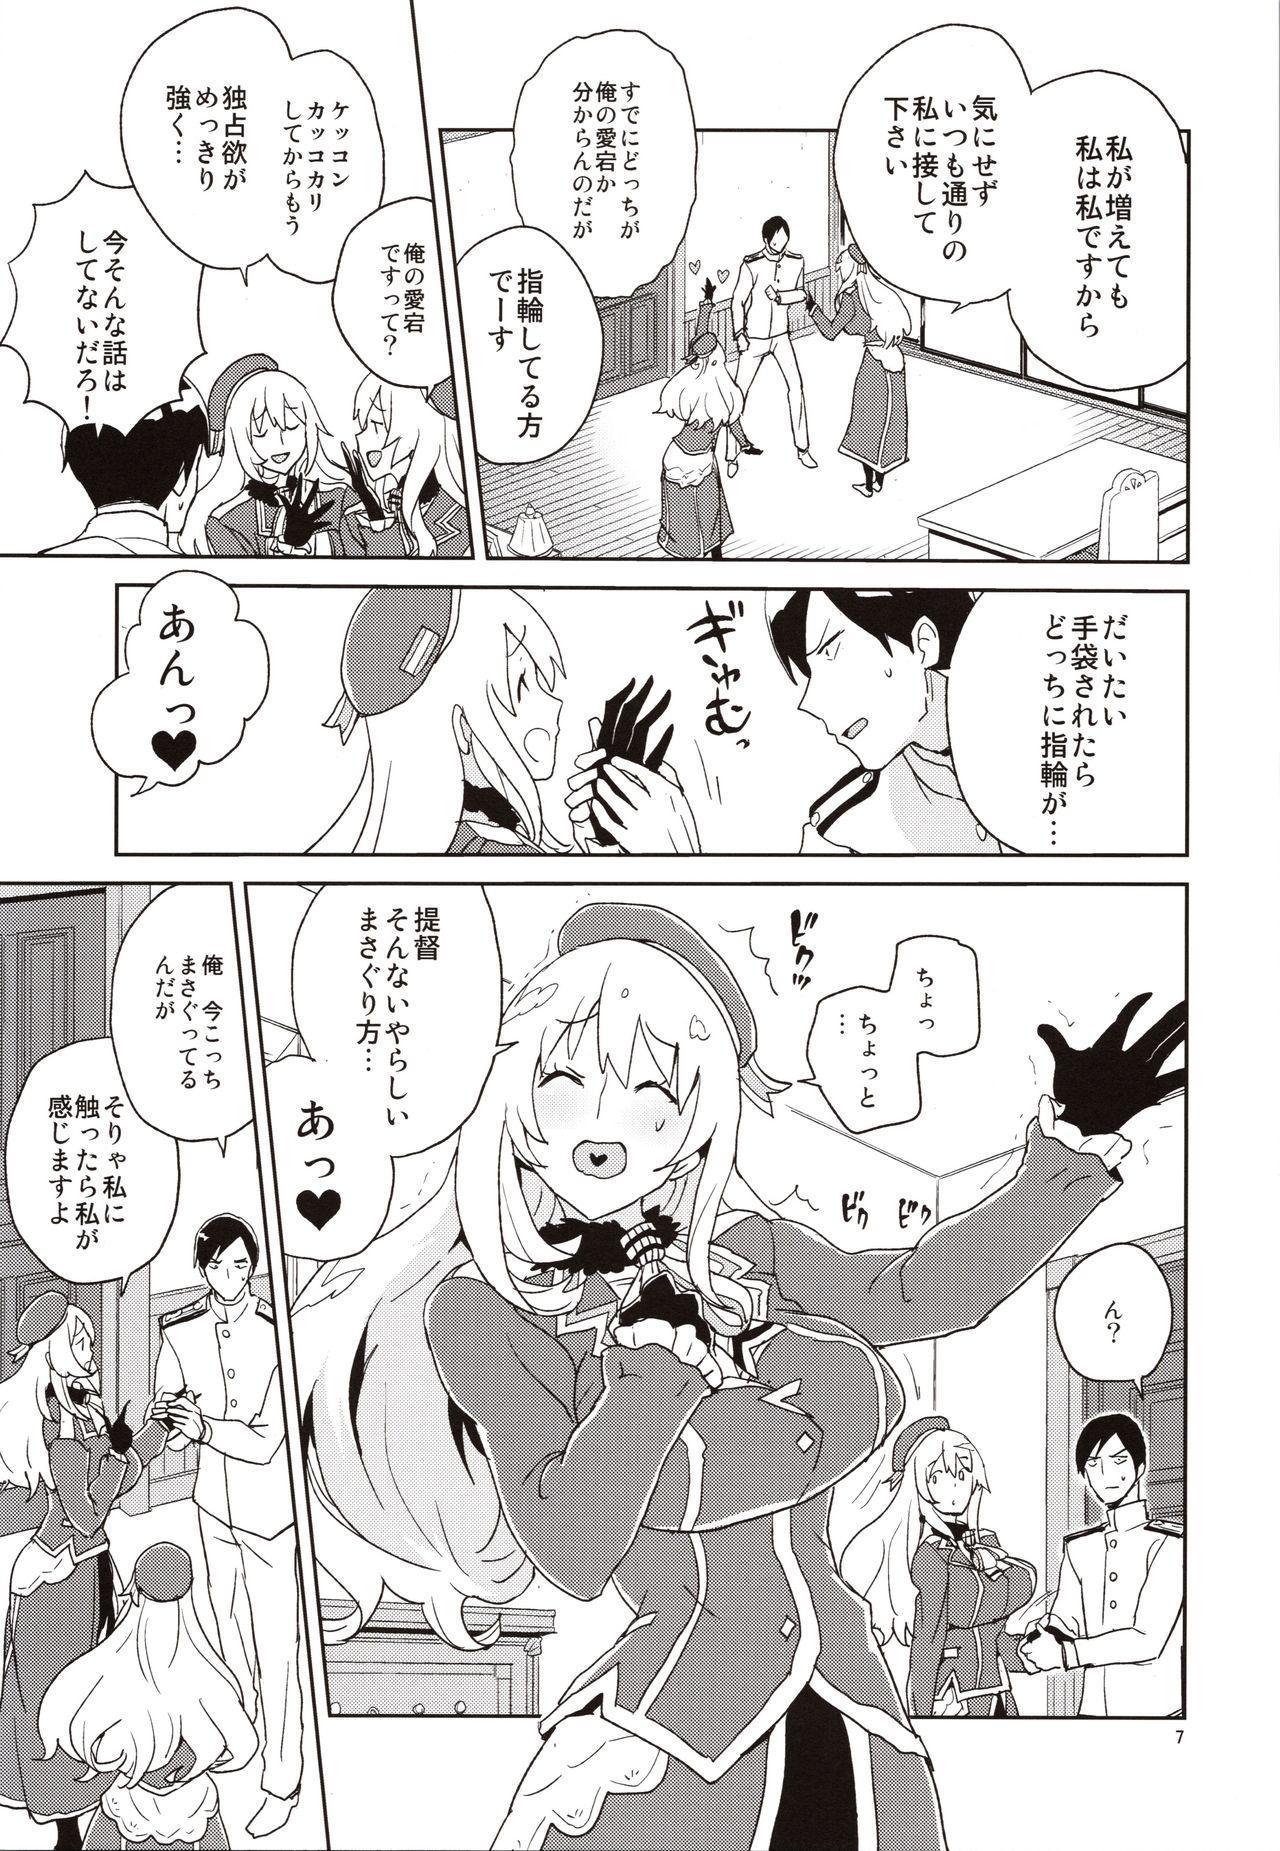 Atago-san no Nijou 5